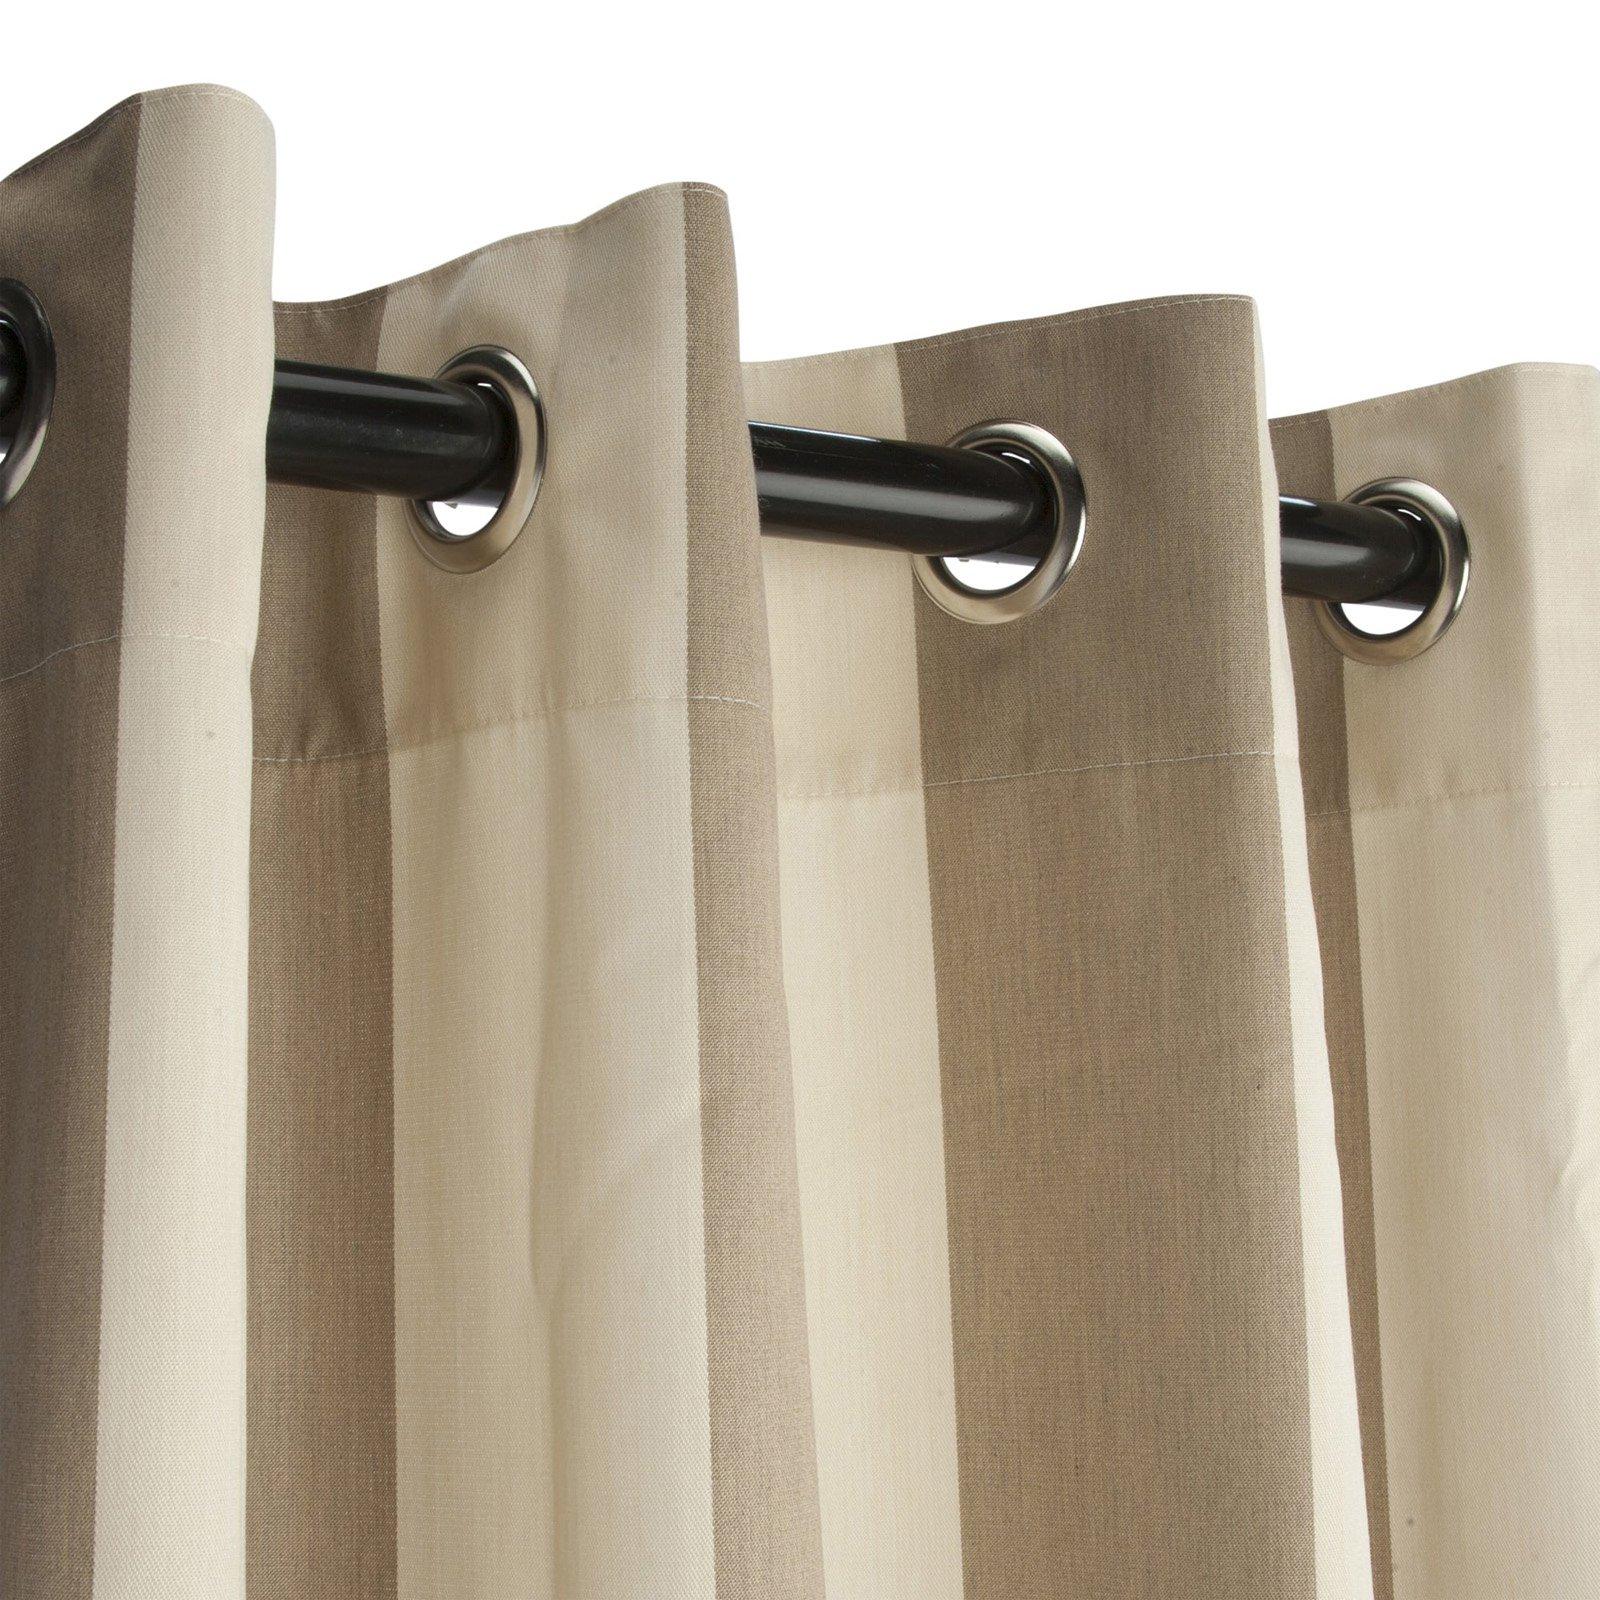 Pawleys Island Sunbrella Grommet Top Striped Outdoor Curtain